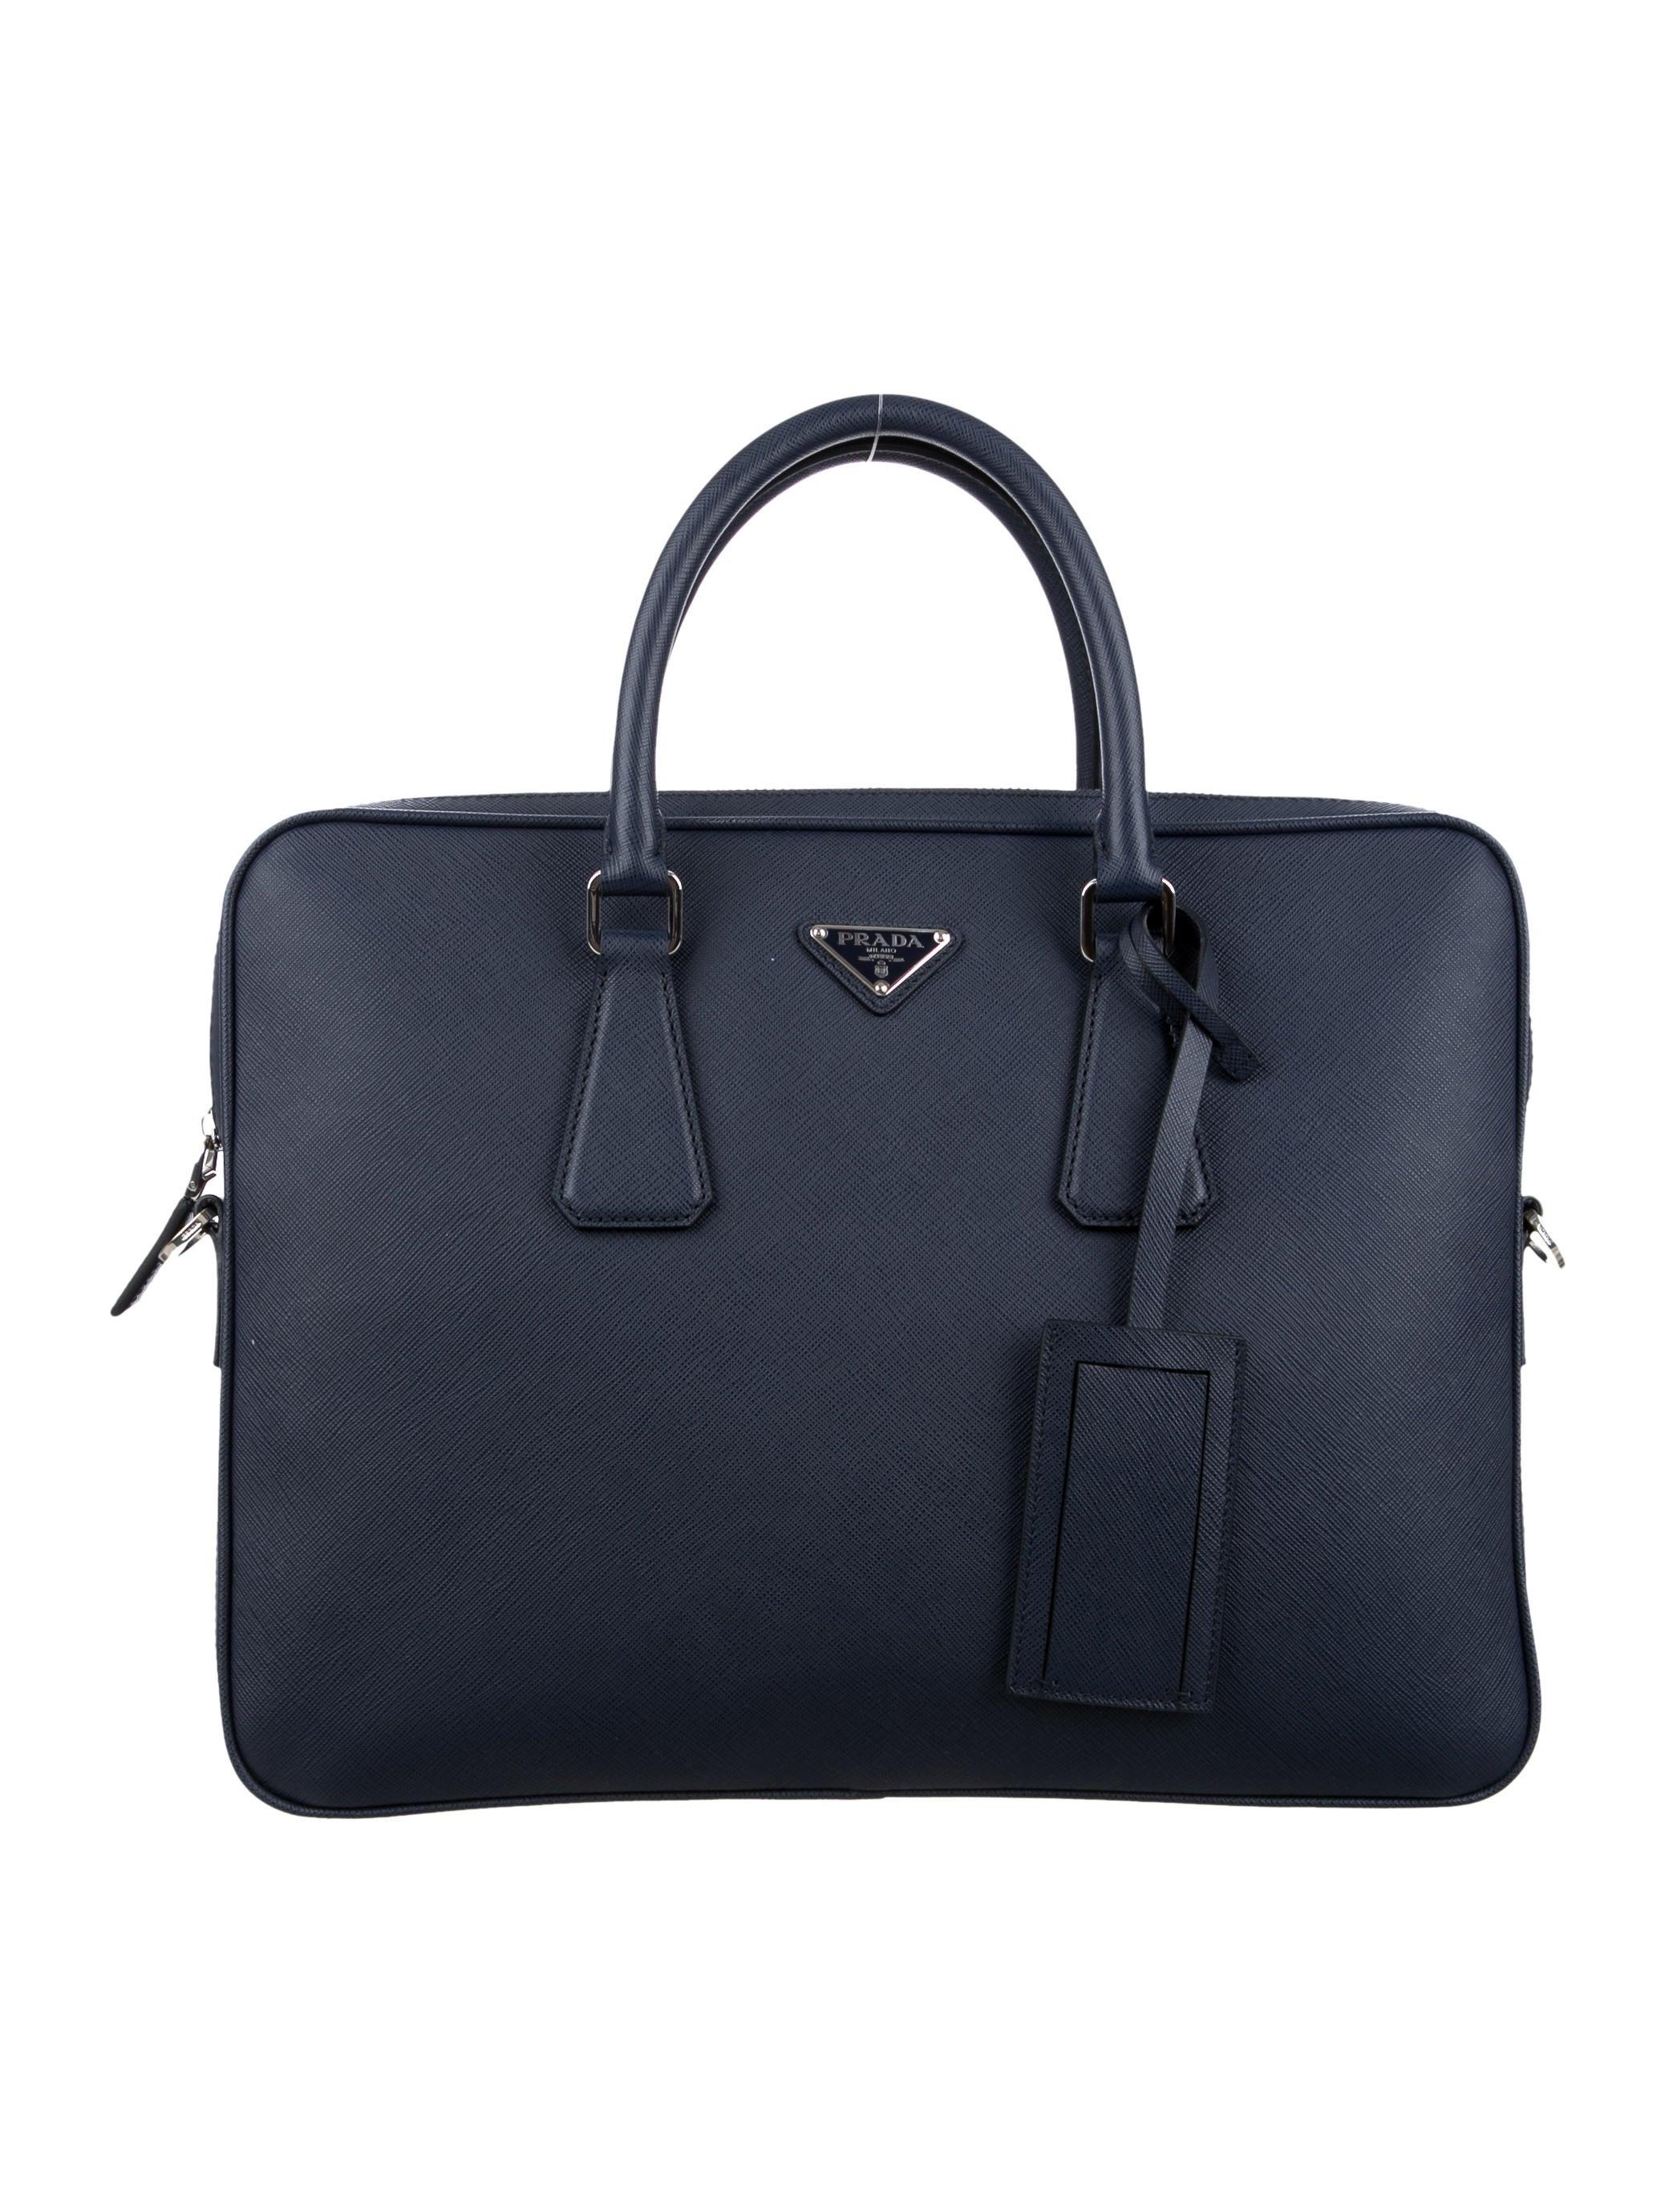 Prada Saffiano Leather Travel Briefcase W Tags Bags